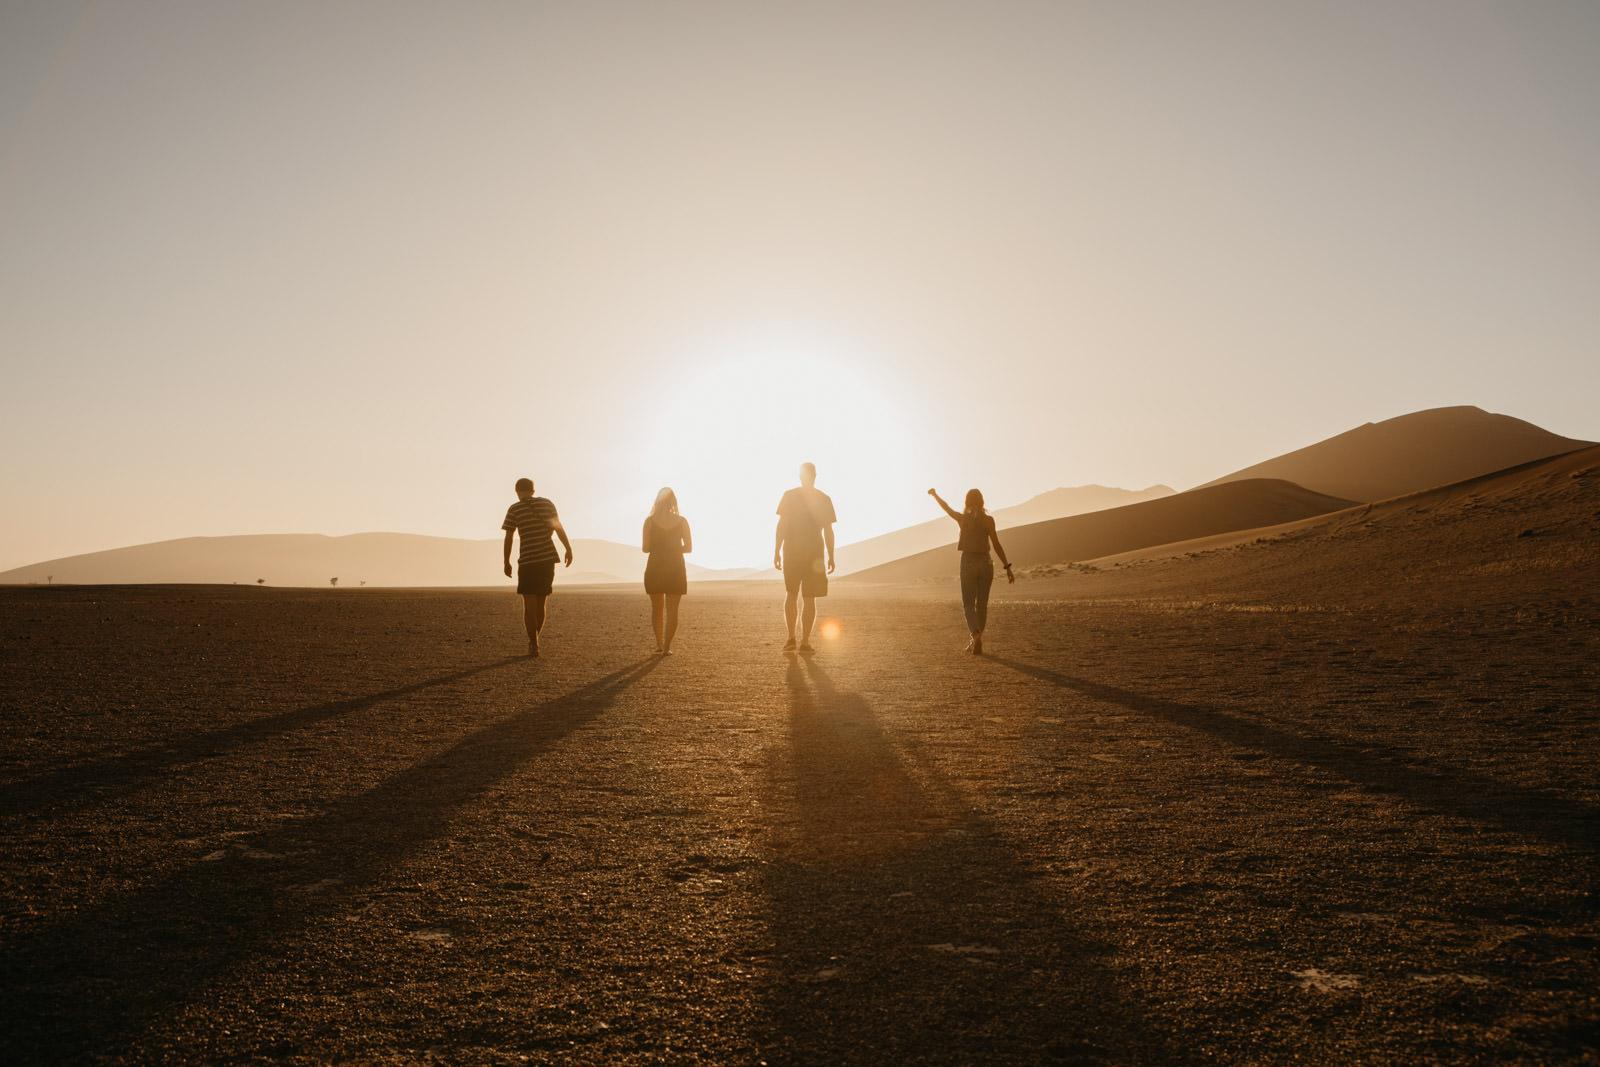 namibia_trip_rooftent_camping_roadtrip (12 von 26).jpg